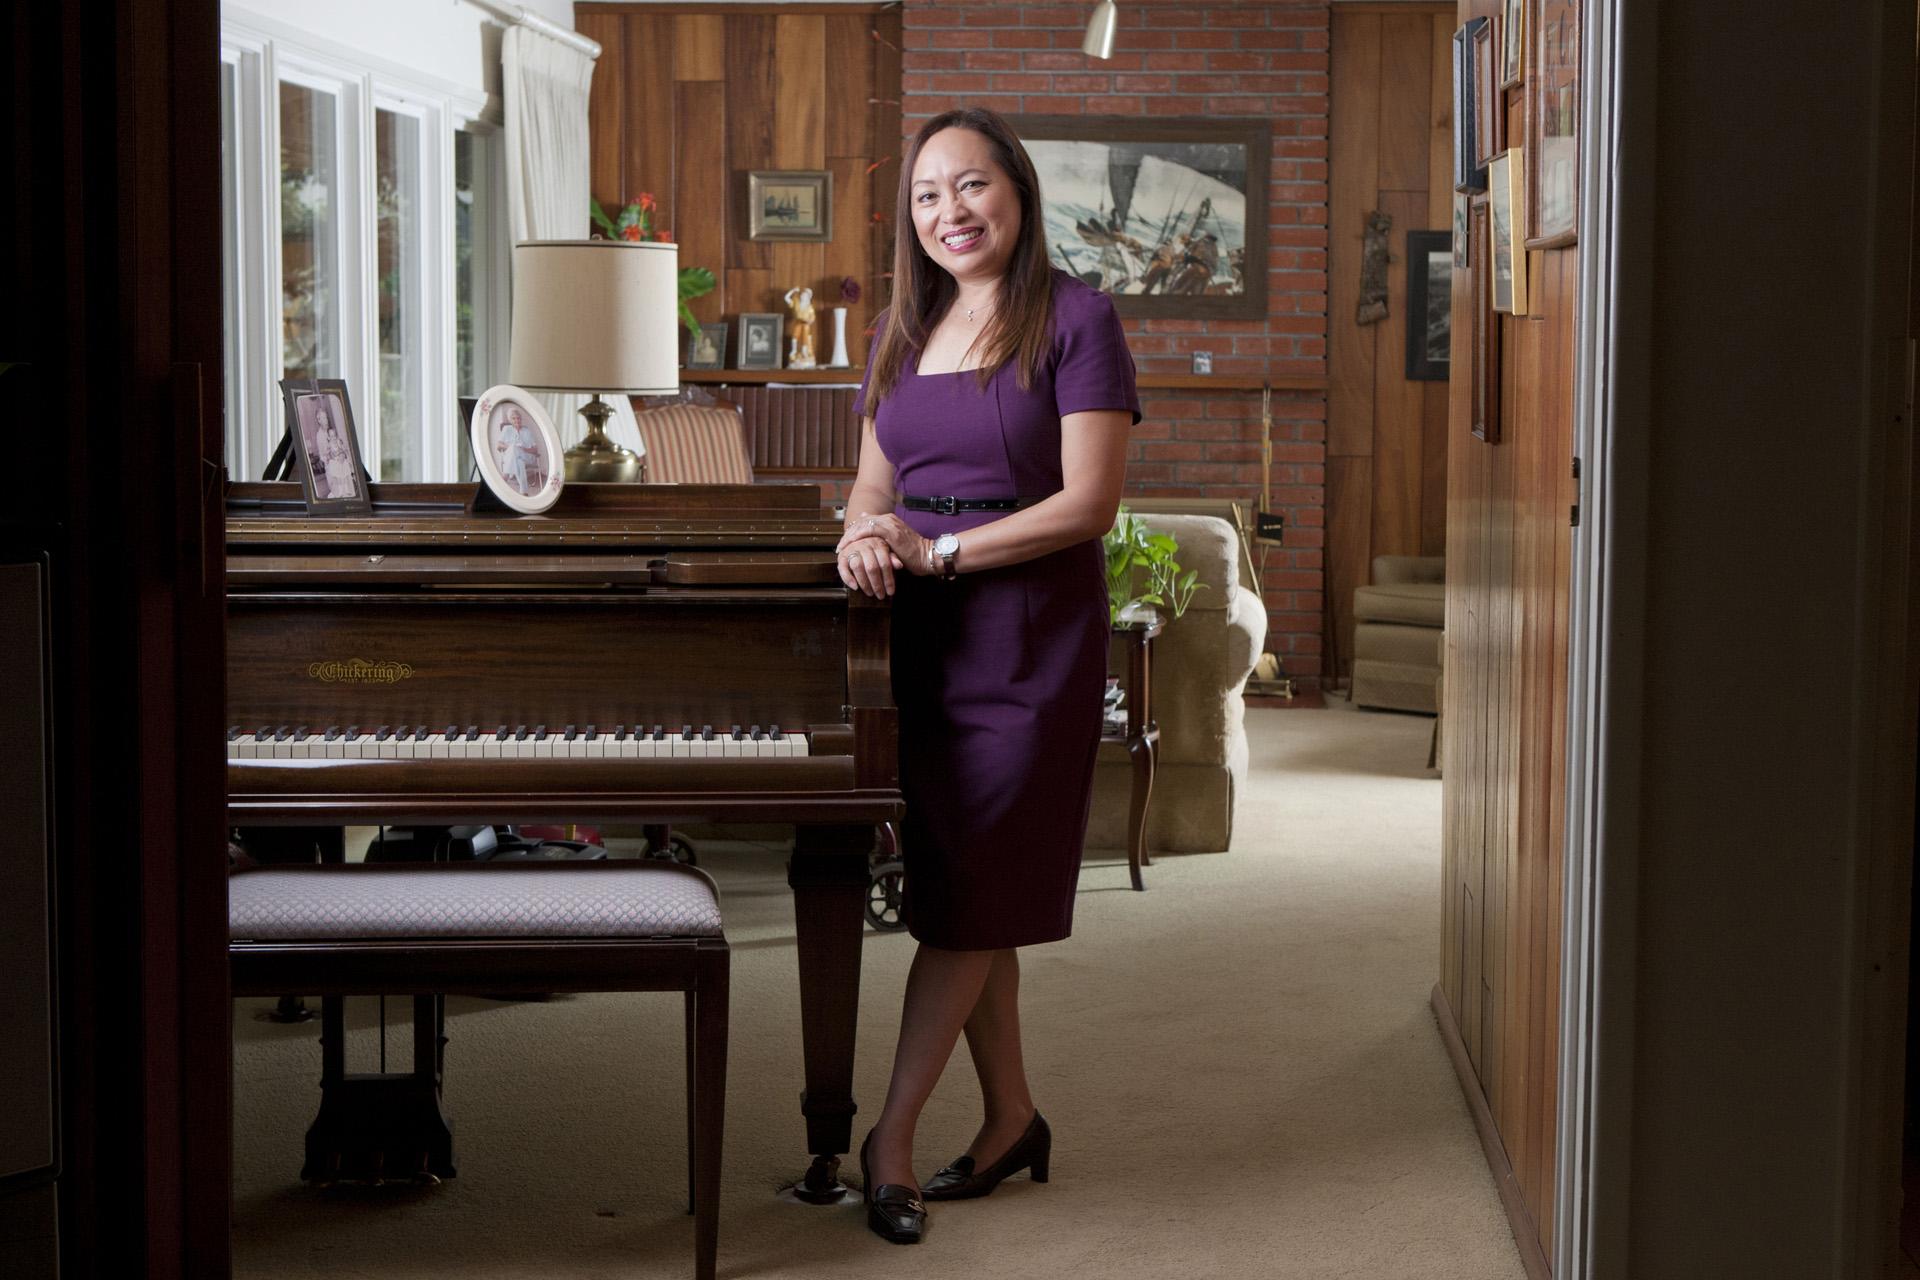 Leslie Cabral, Director of HomeInstead, Policyholder